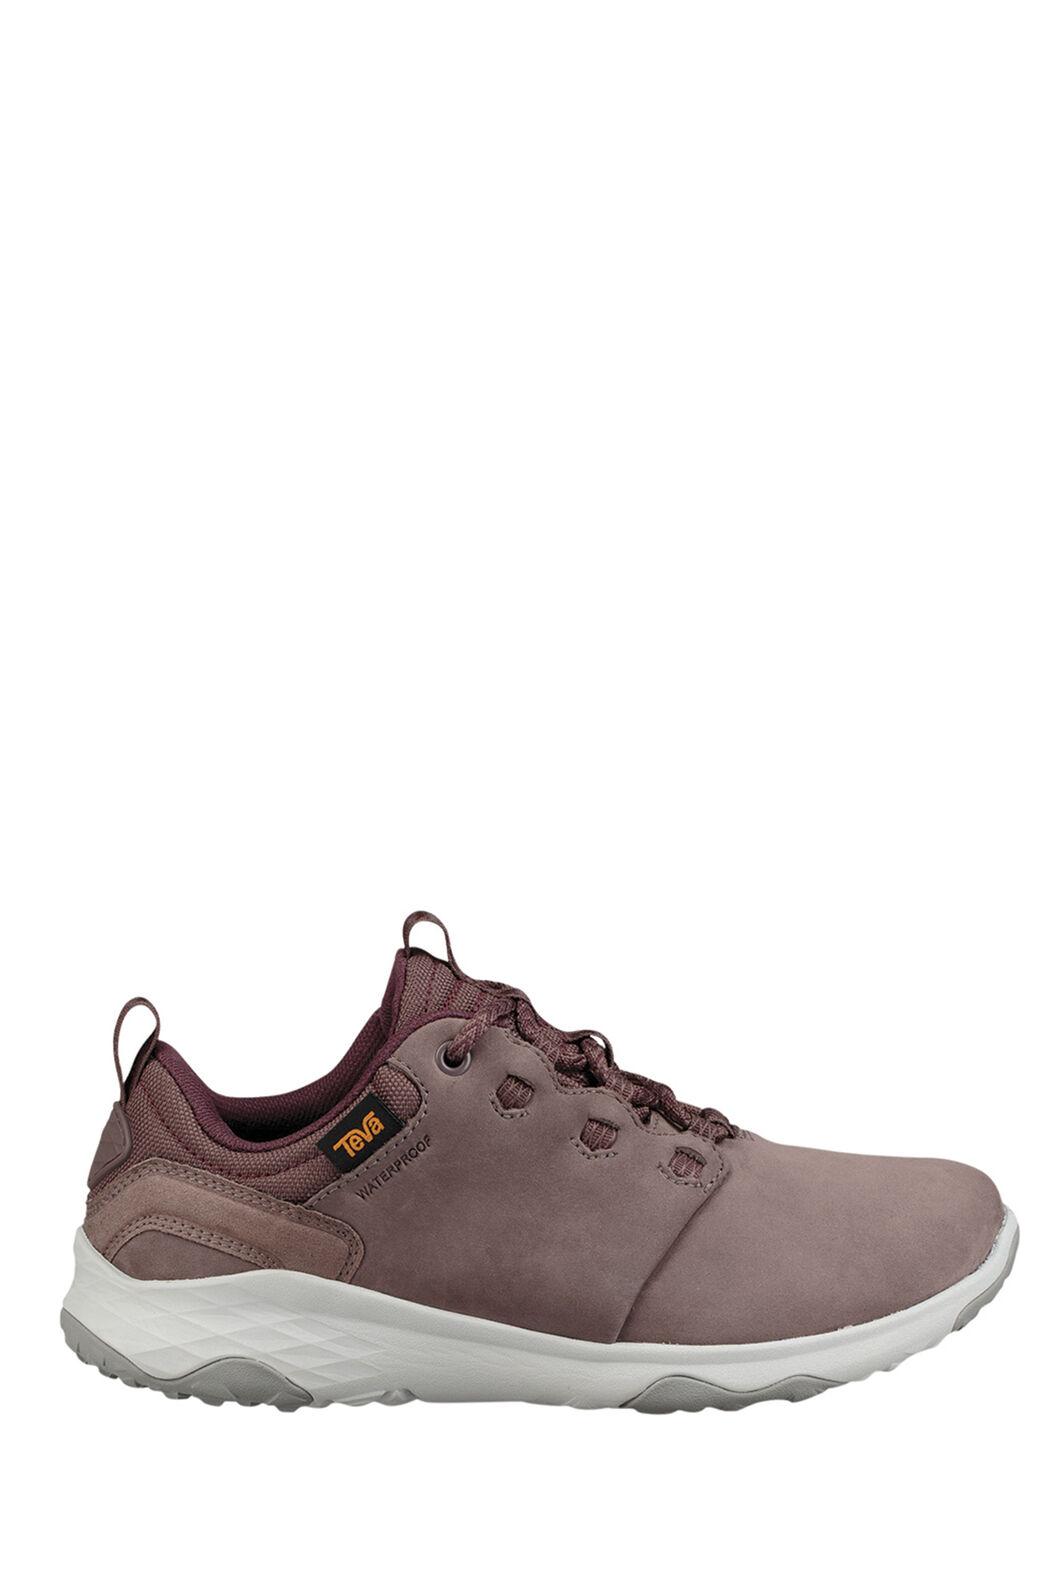 Teva Women's Arrowood 2 Casual Shoe, PLUM TRUFFLE, hi-res